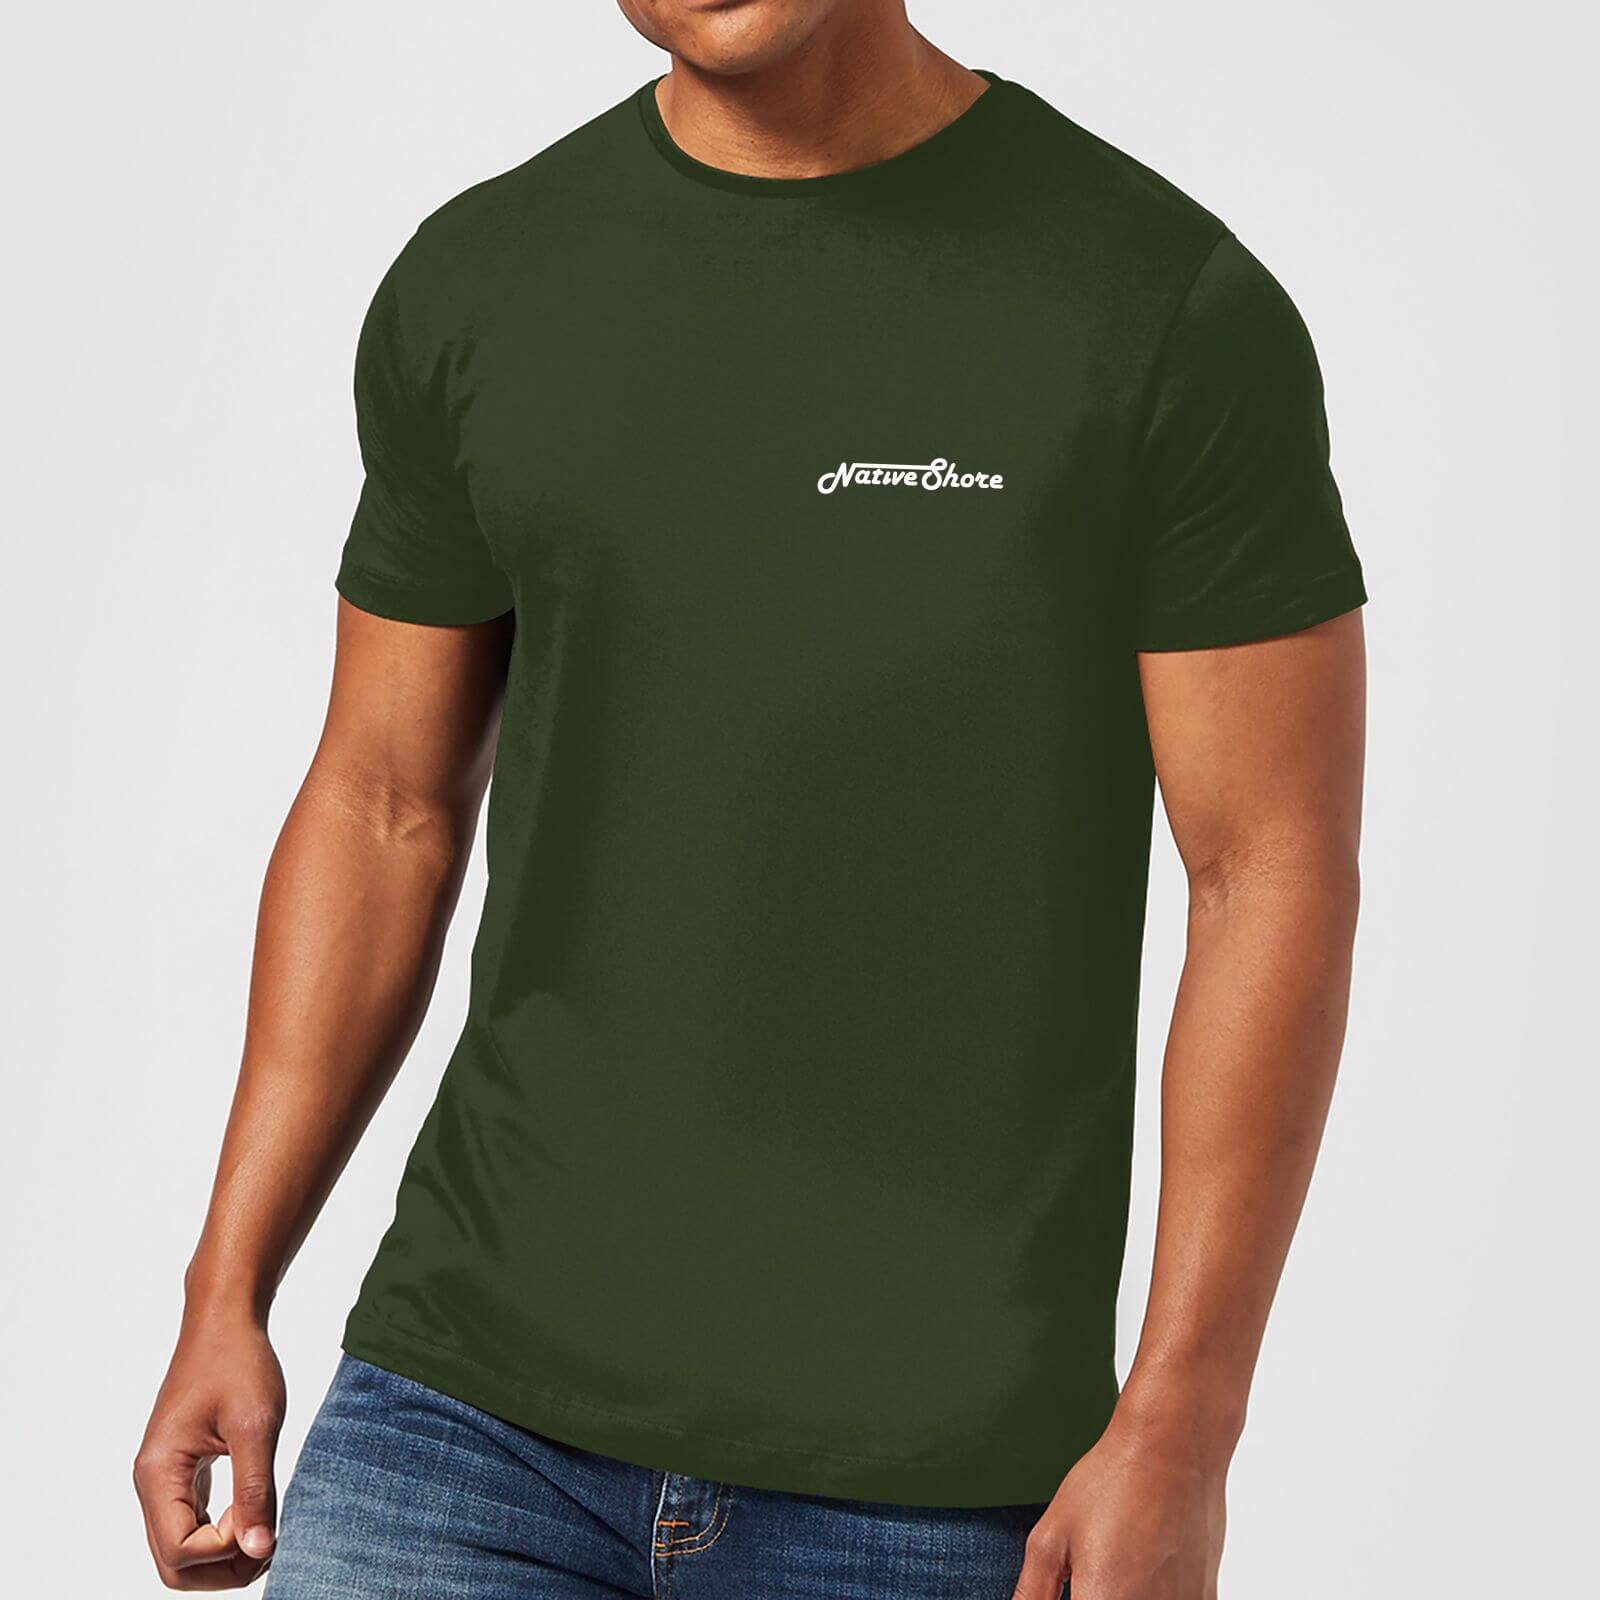 T-Shirt Homme Original Shore Native Shore